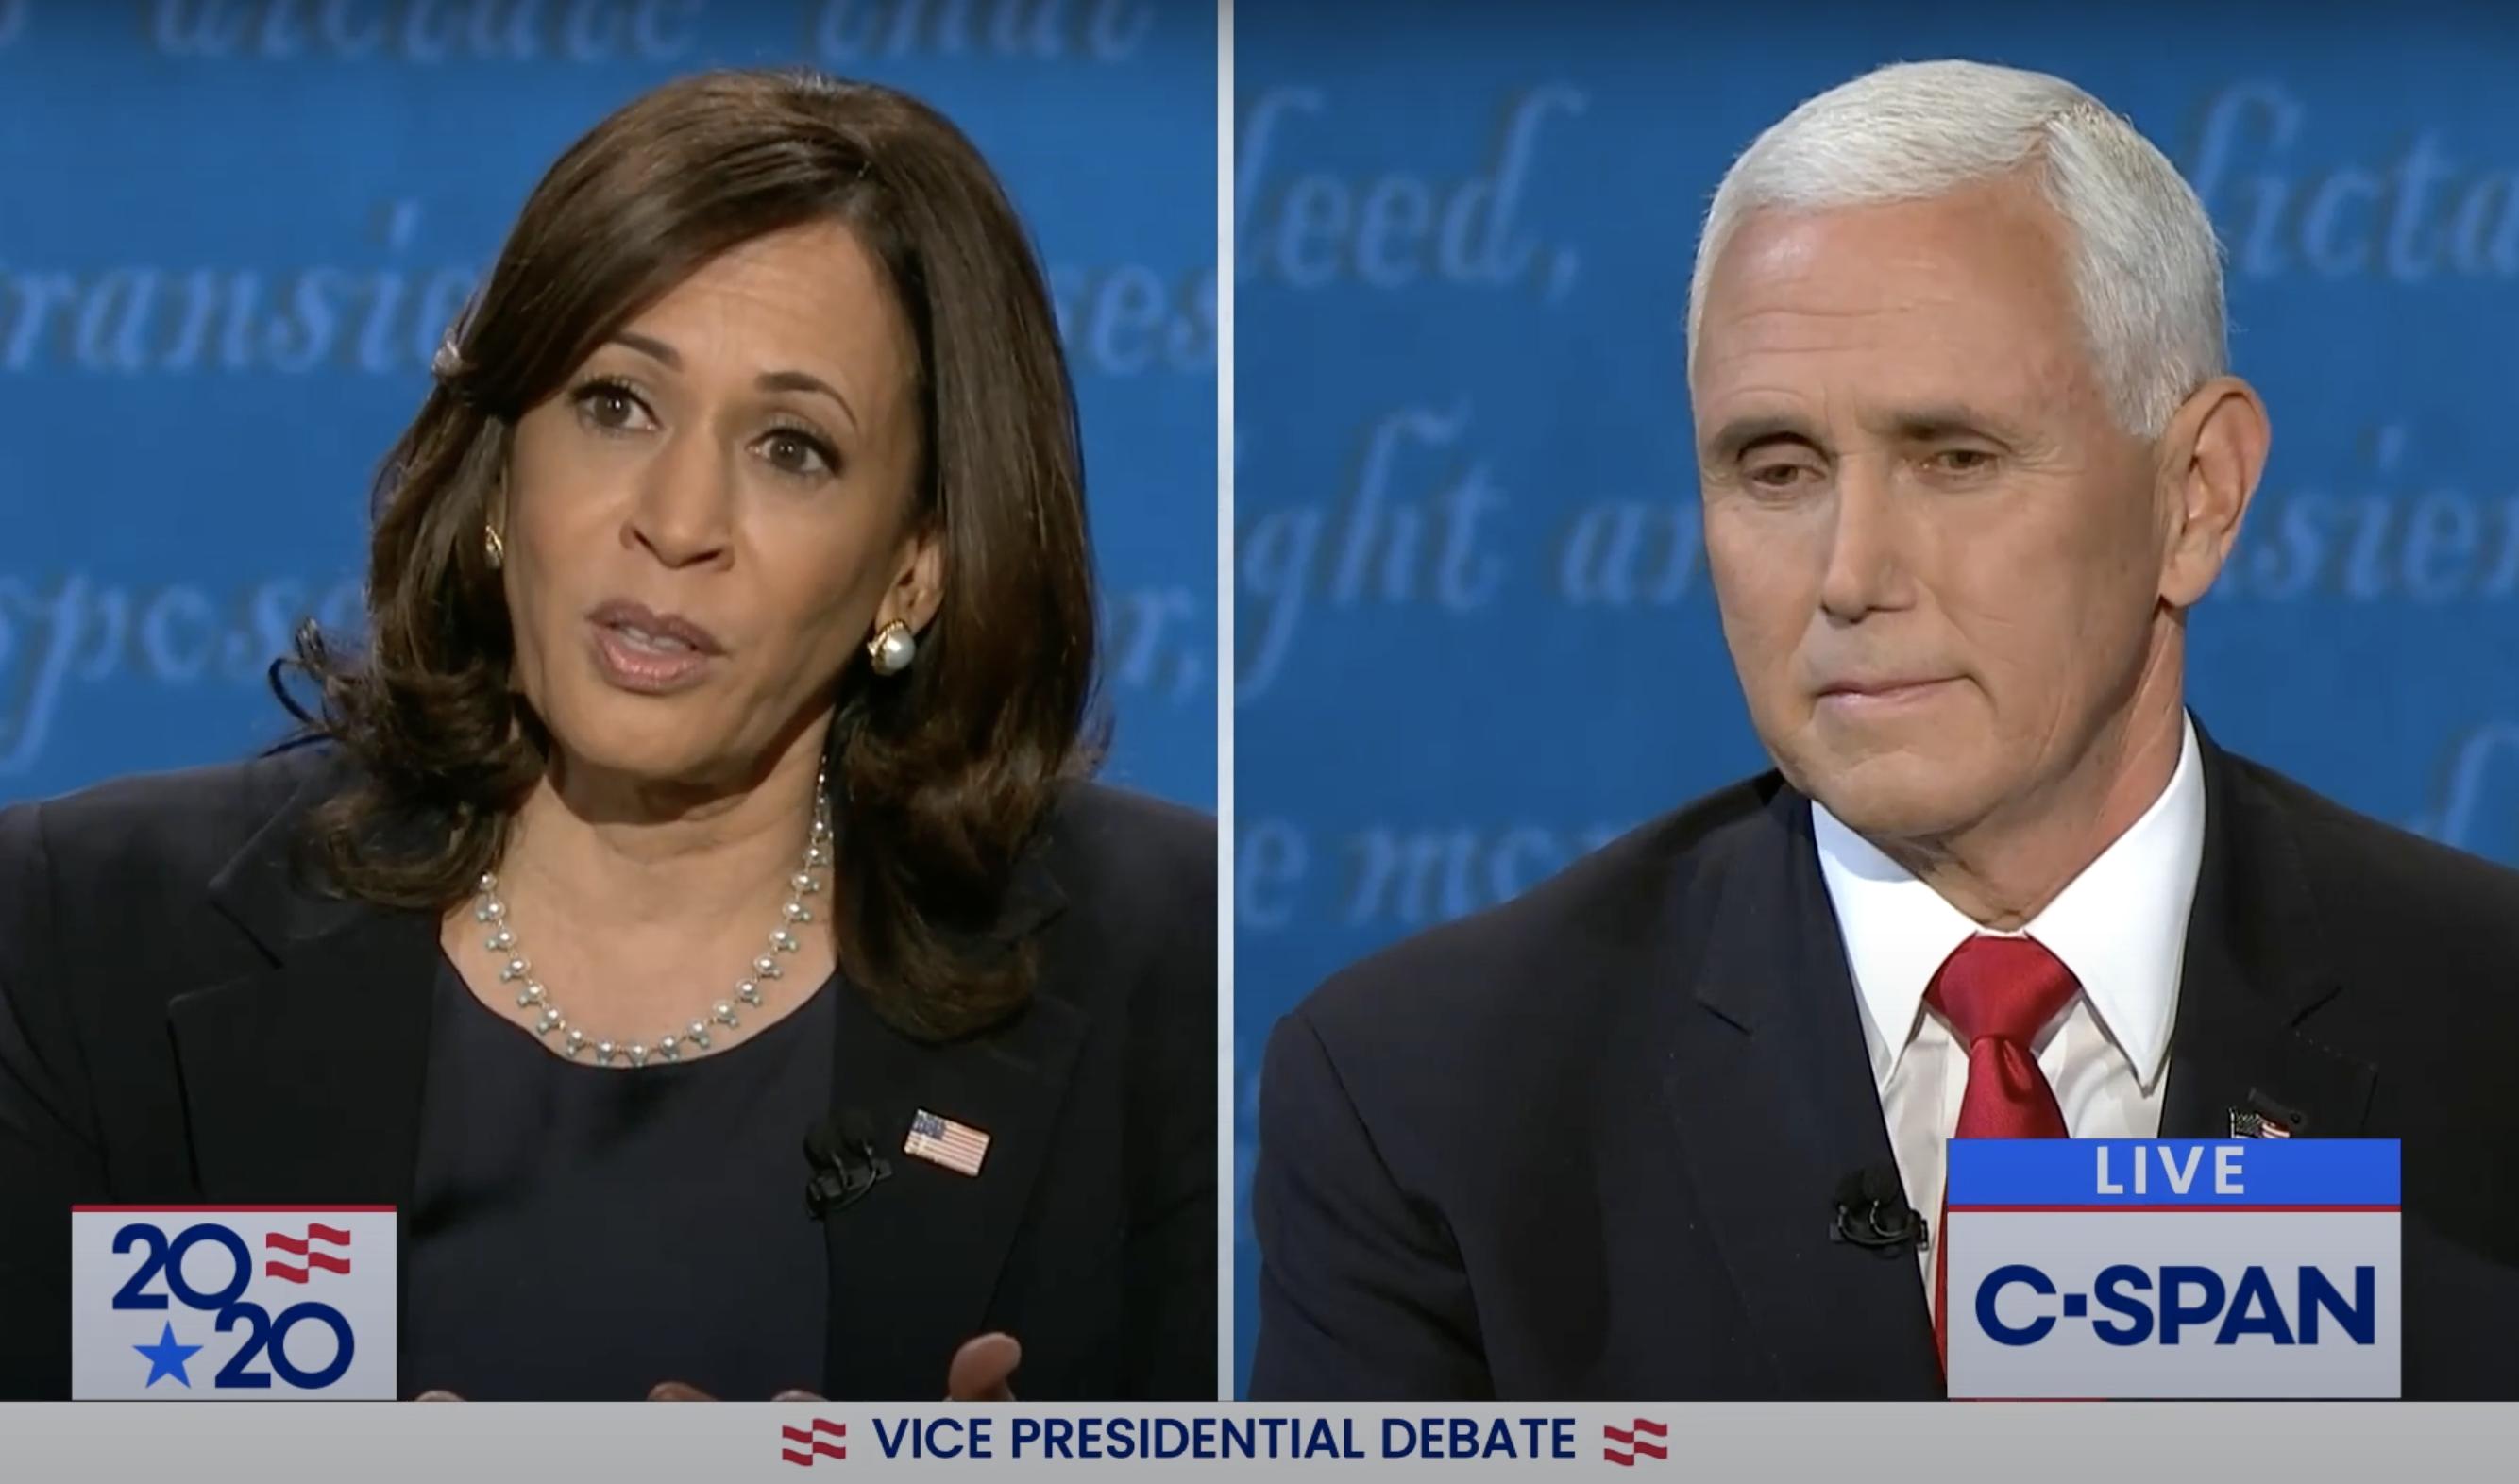 Sen. Kamala Harris, left, and incumbent Vice President Mike Pence during Vice Presidential Debate, Oct. 7.